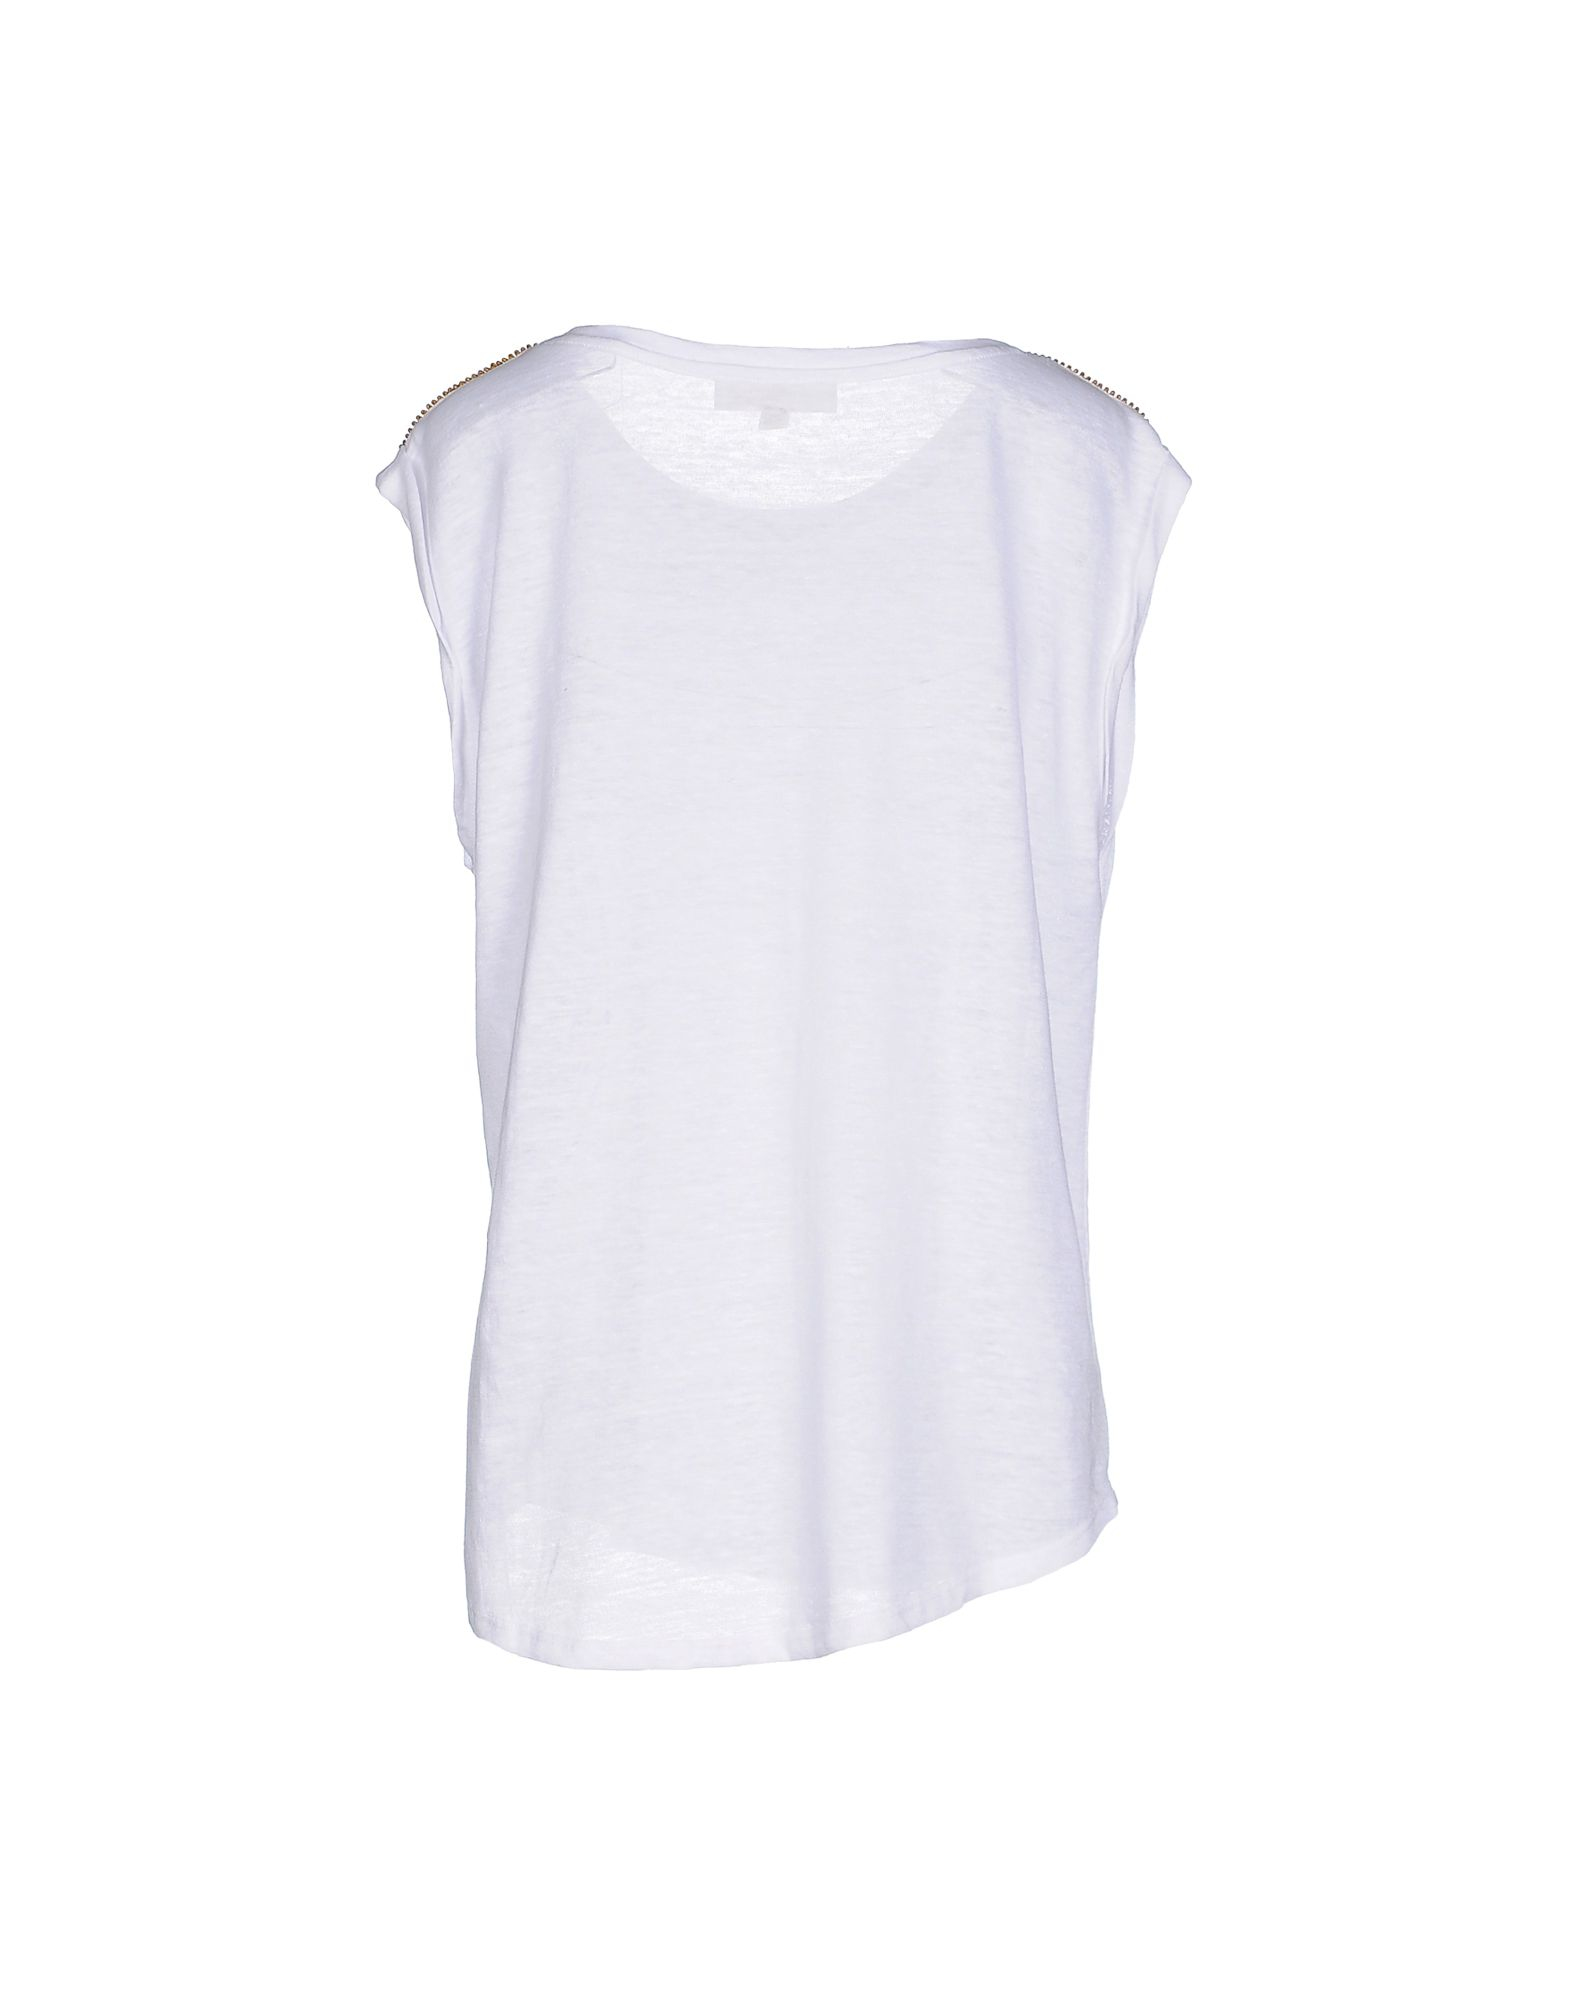 michael michael kors t shirt in white lyst. Black Bedroom Furniture Sets. Home Design Ideas